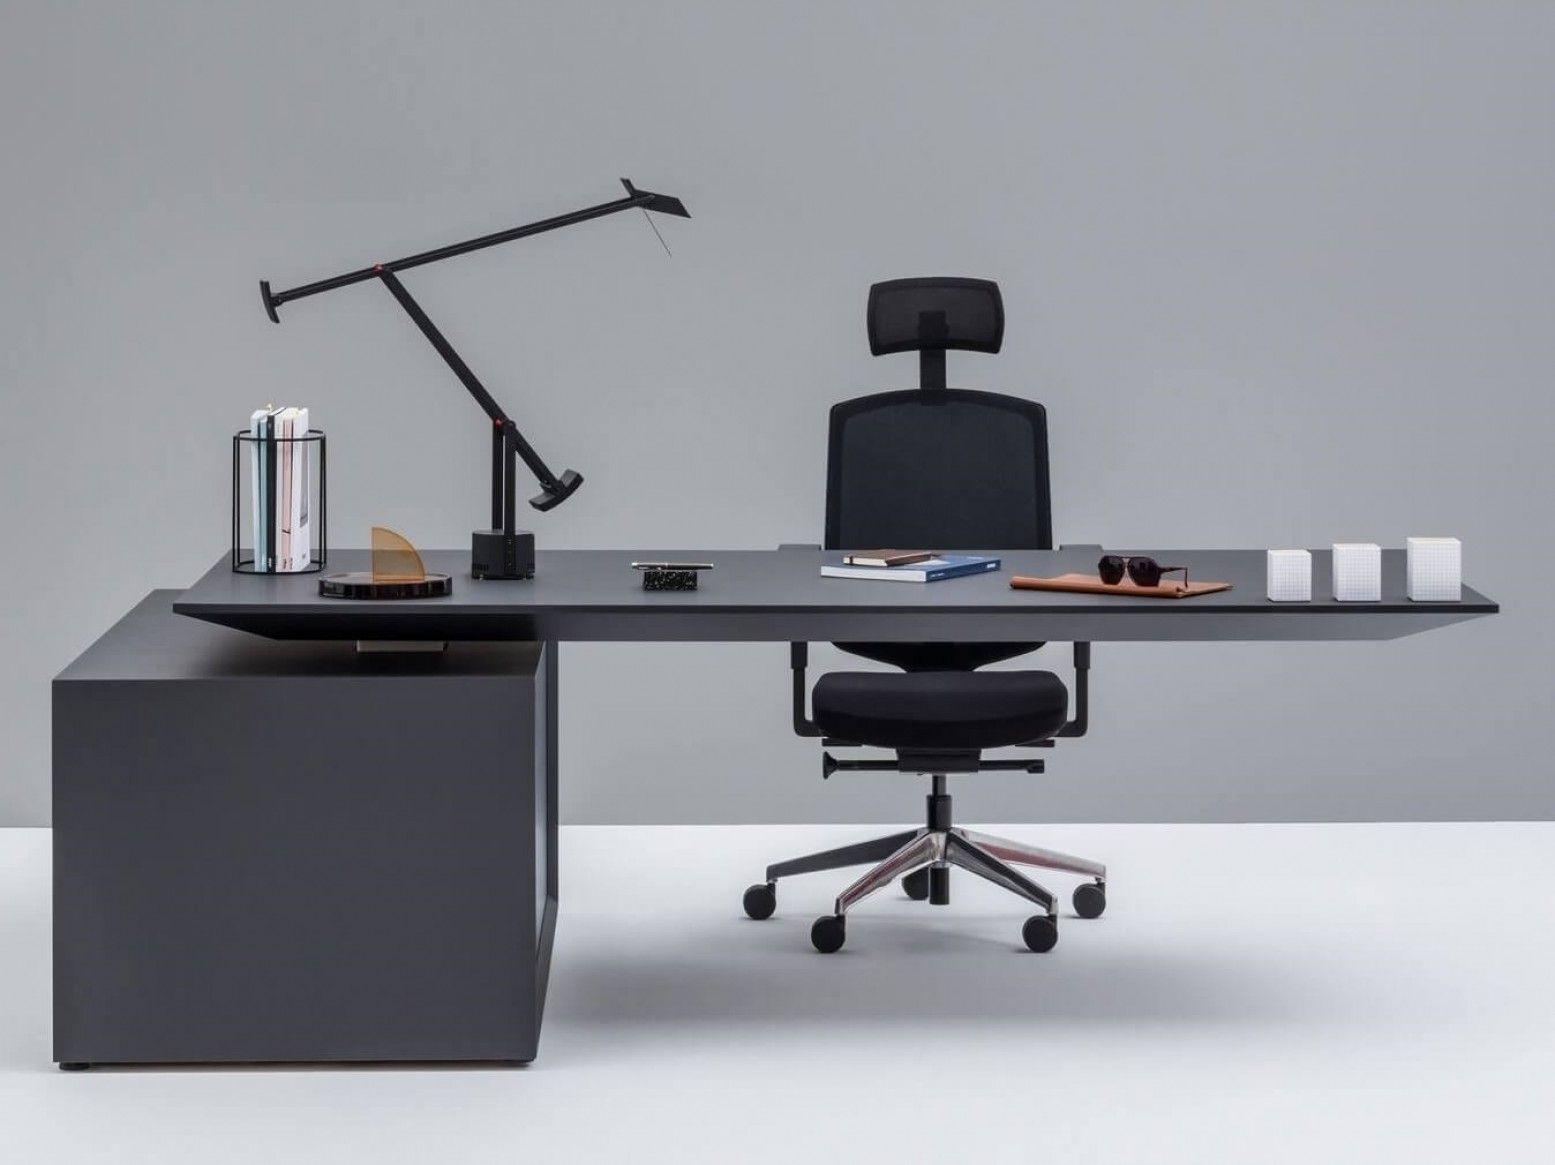 Gravity L Shape Electric Height Adjustable Desk W Managerial Storage Modern Office Desk Design Adjustable Height Desk Adjustable Desk